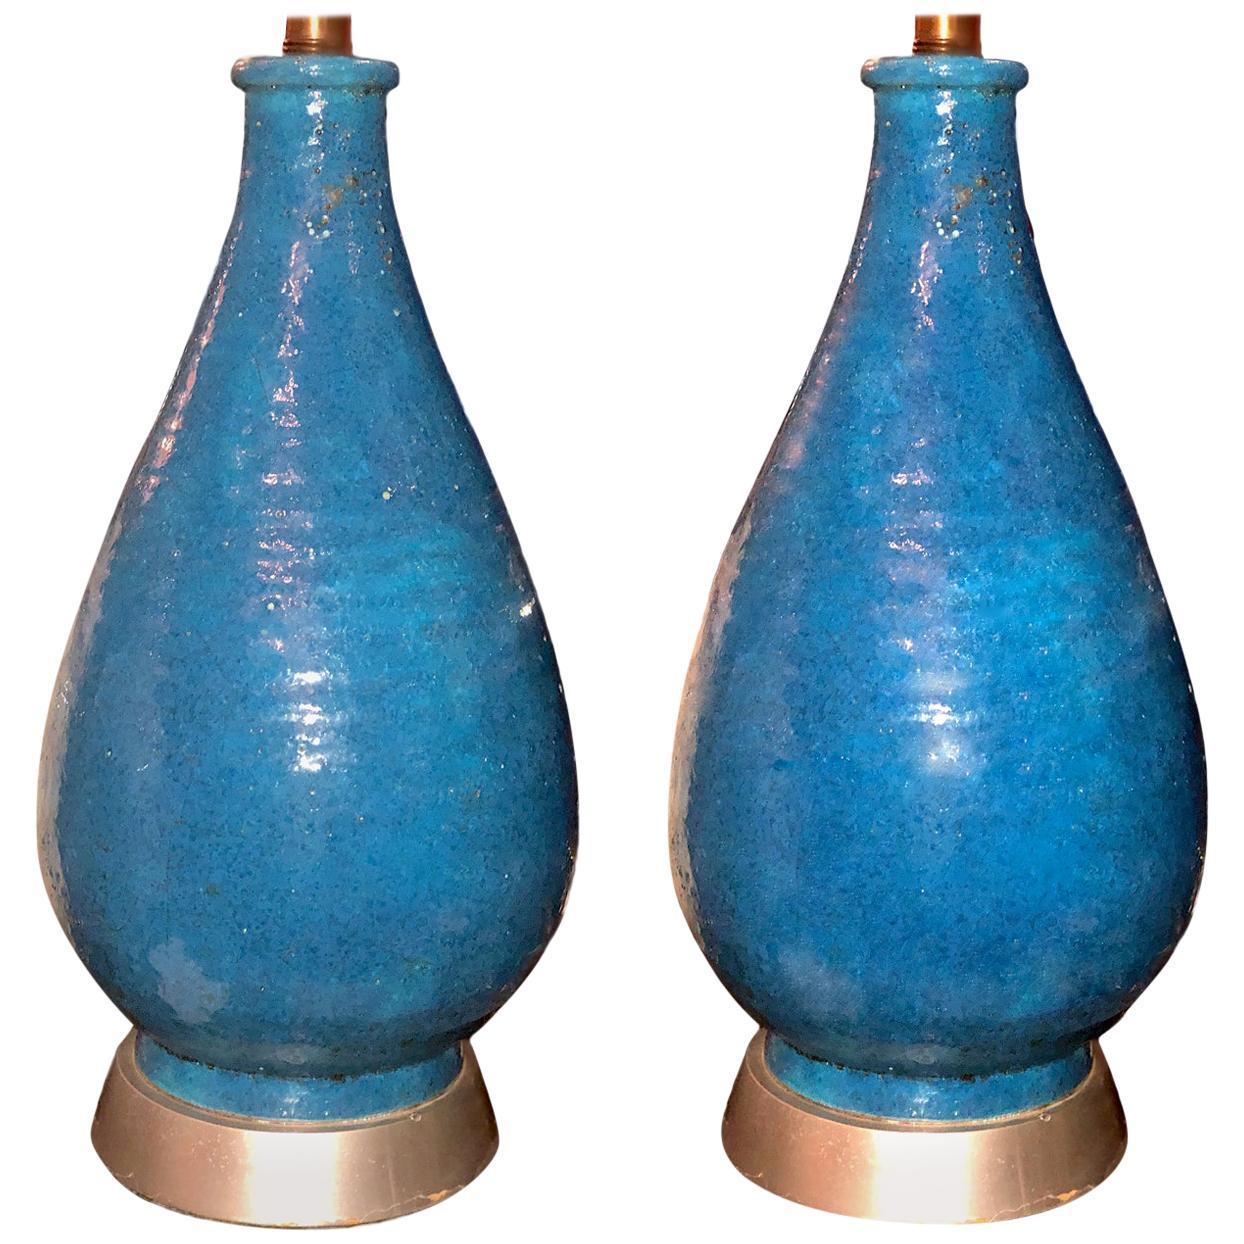 Pair of Midcentury Blue Ceramic Table Lamps